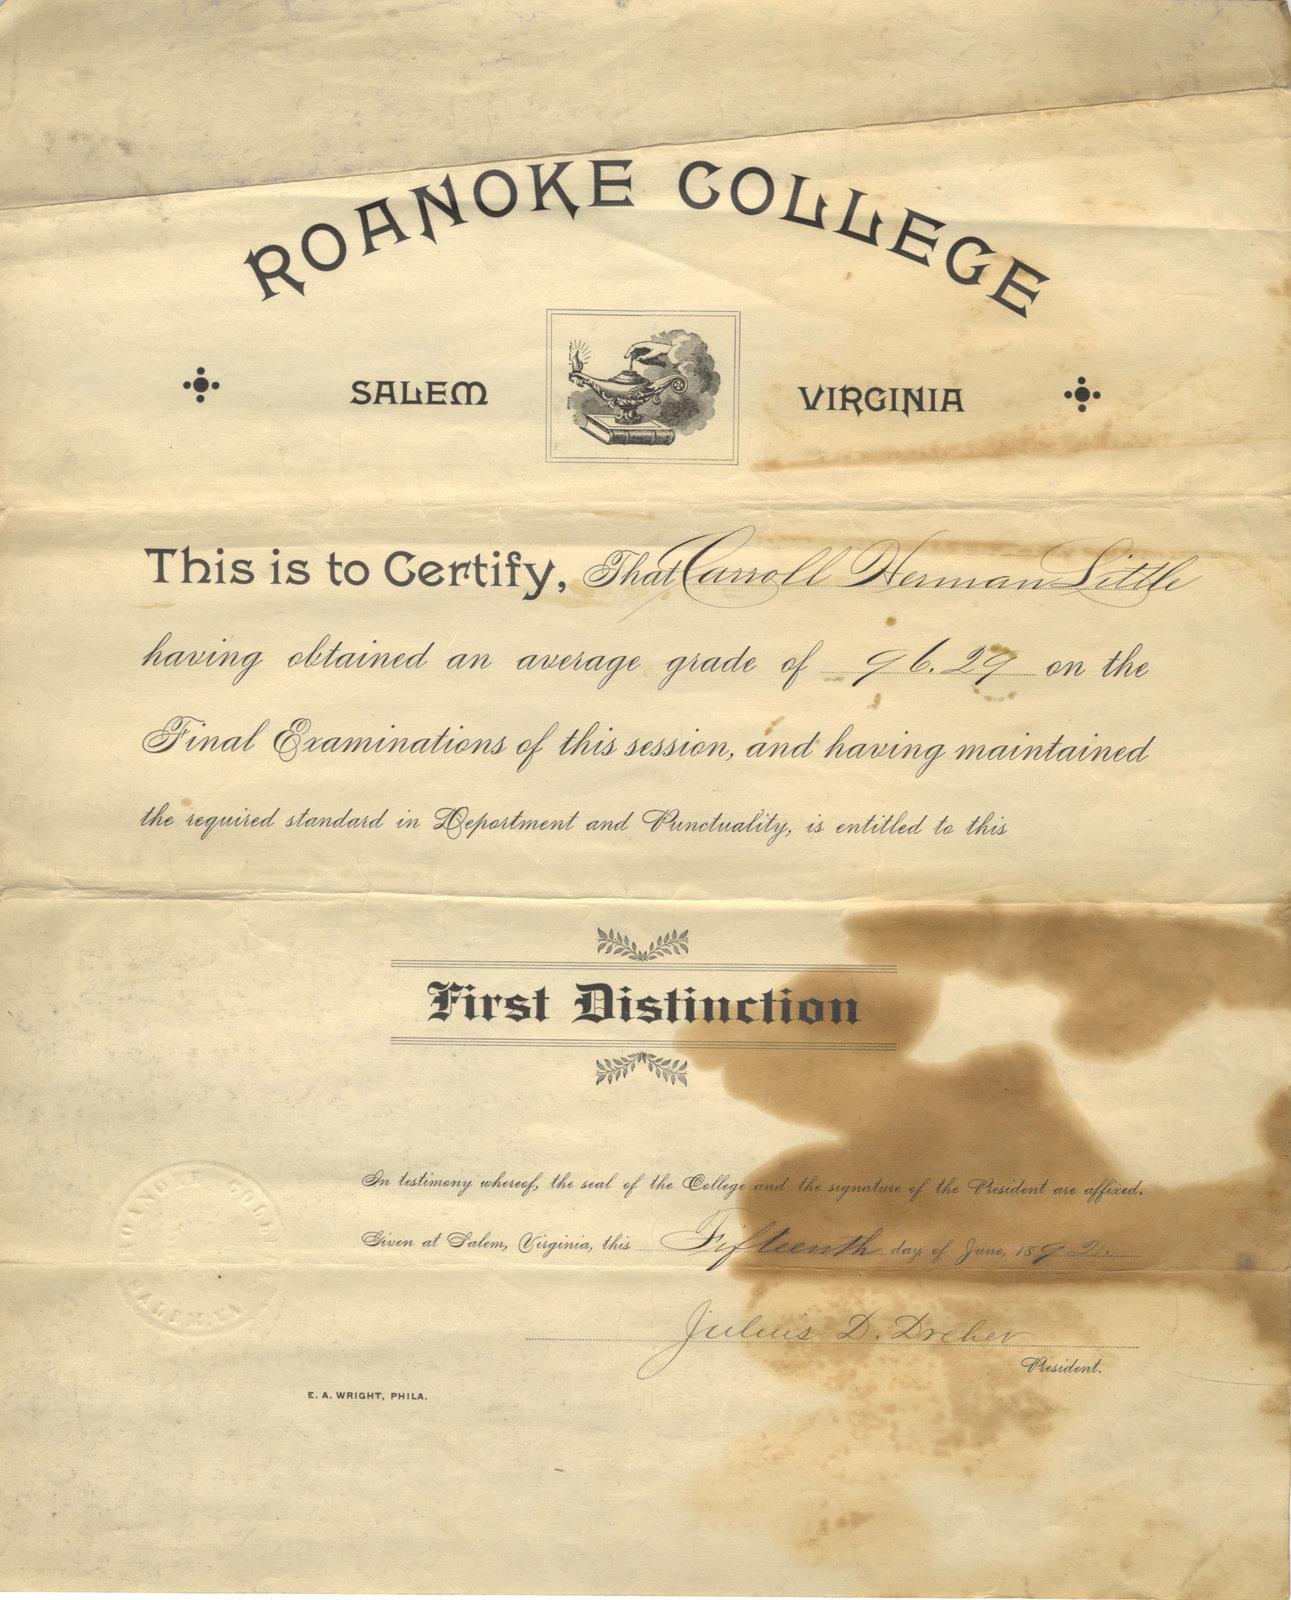 Roanoke College first distinction certificate